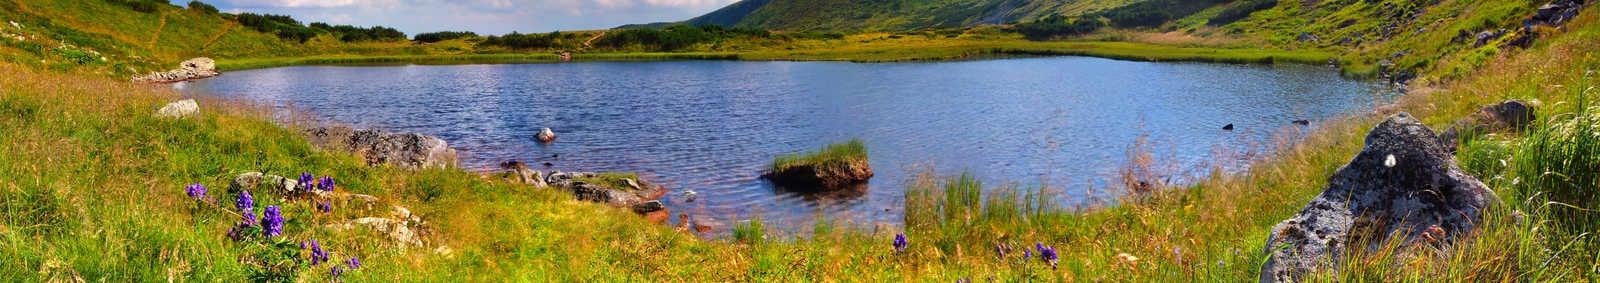 Lake in the Carpathian mountains